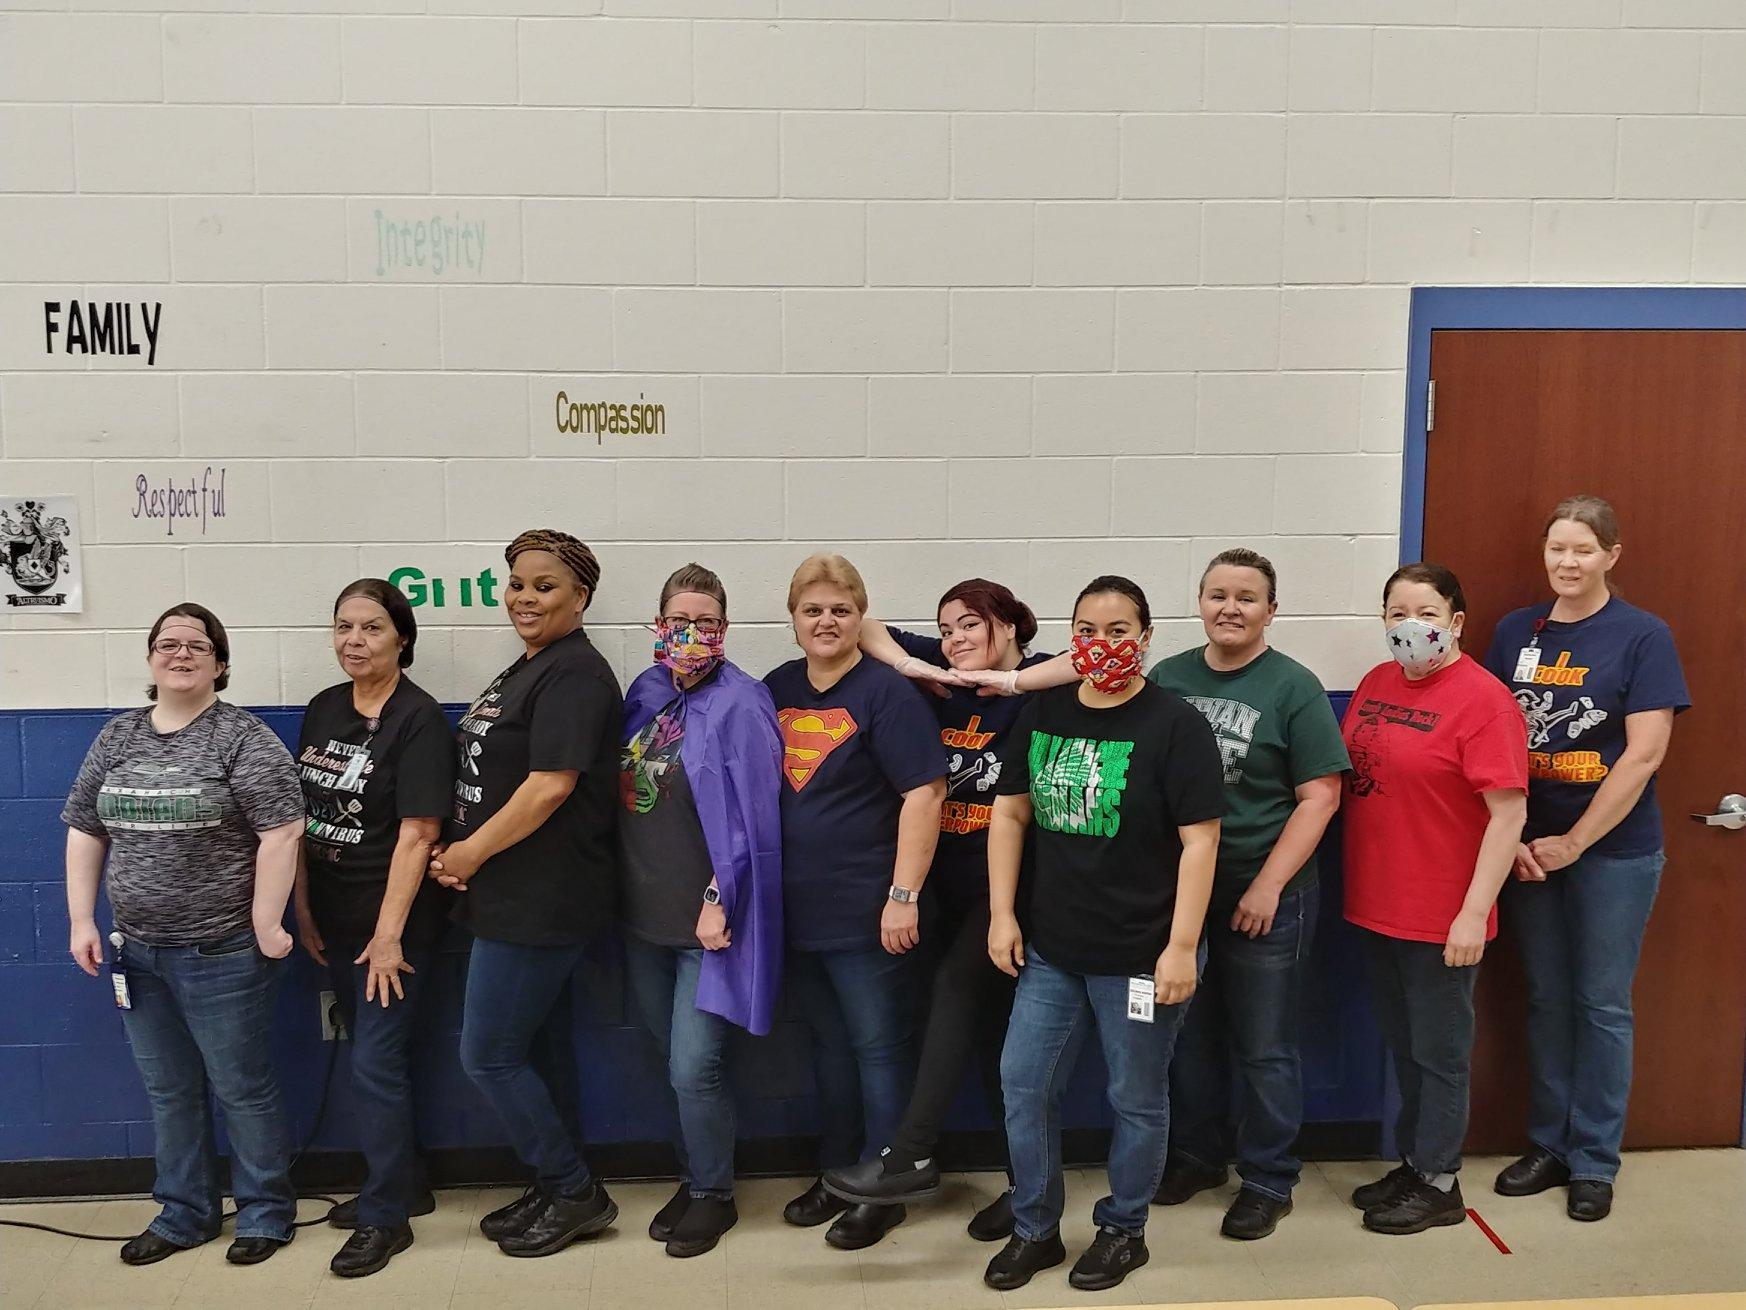 group of ladies in super hero shirts